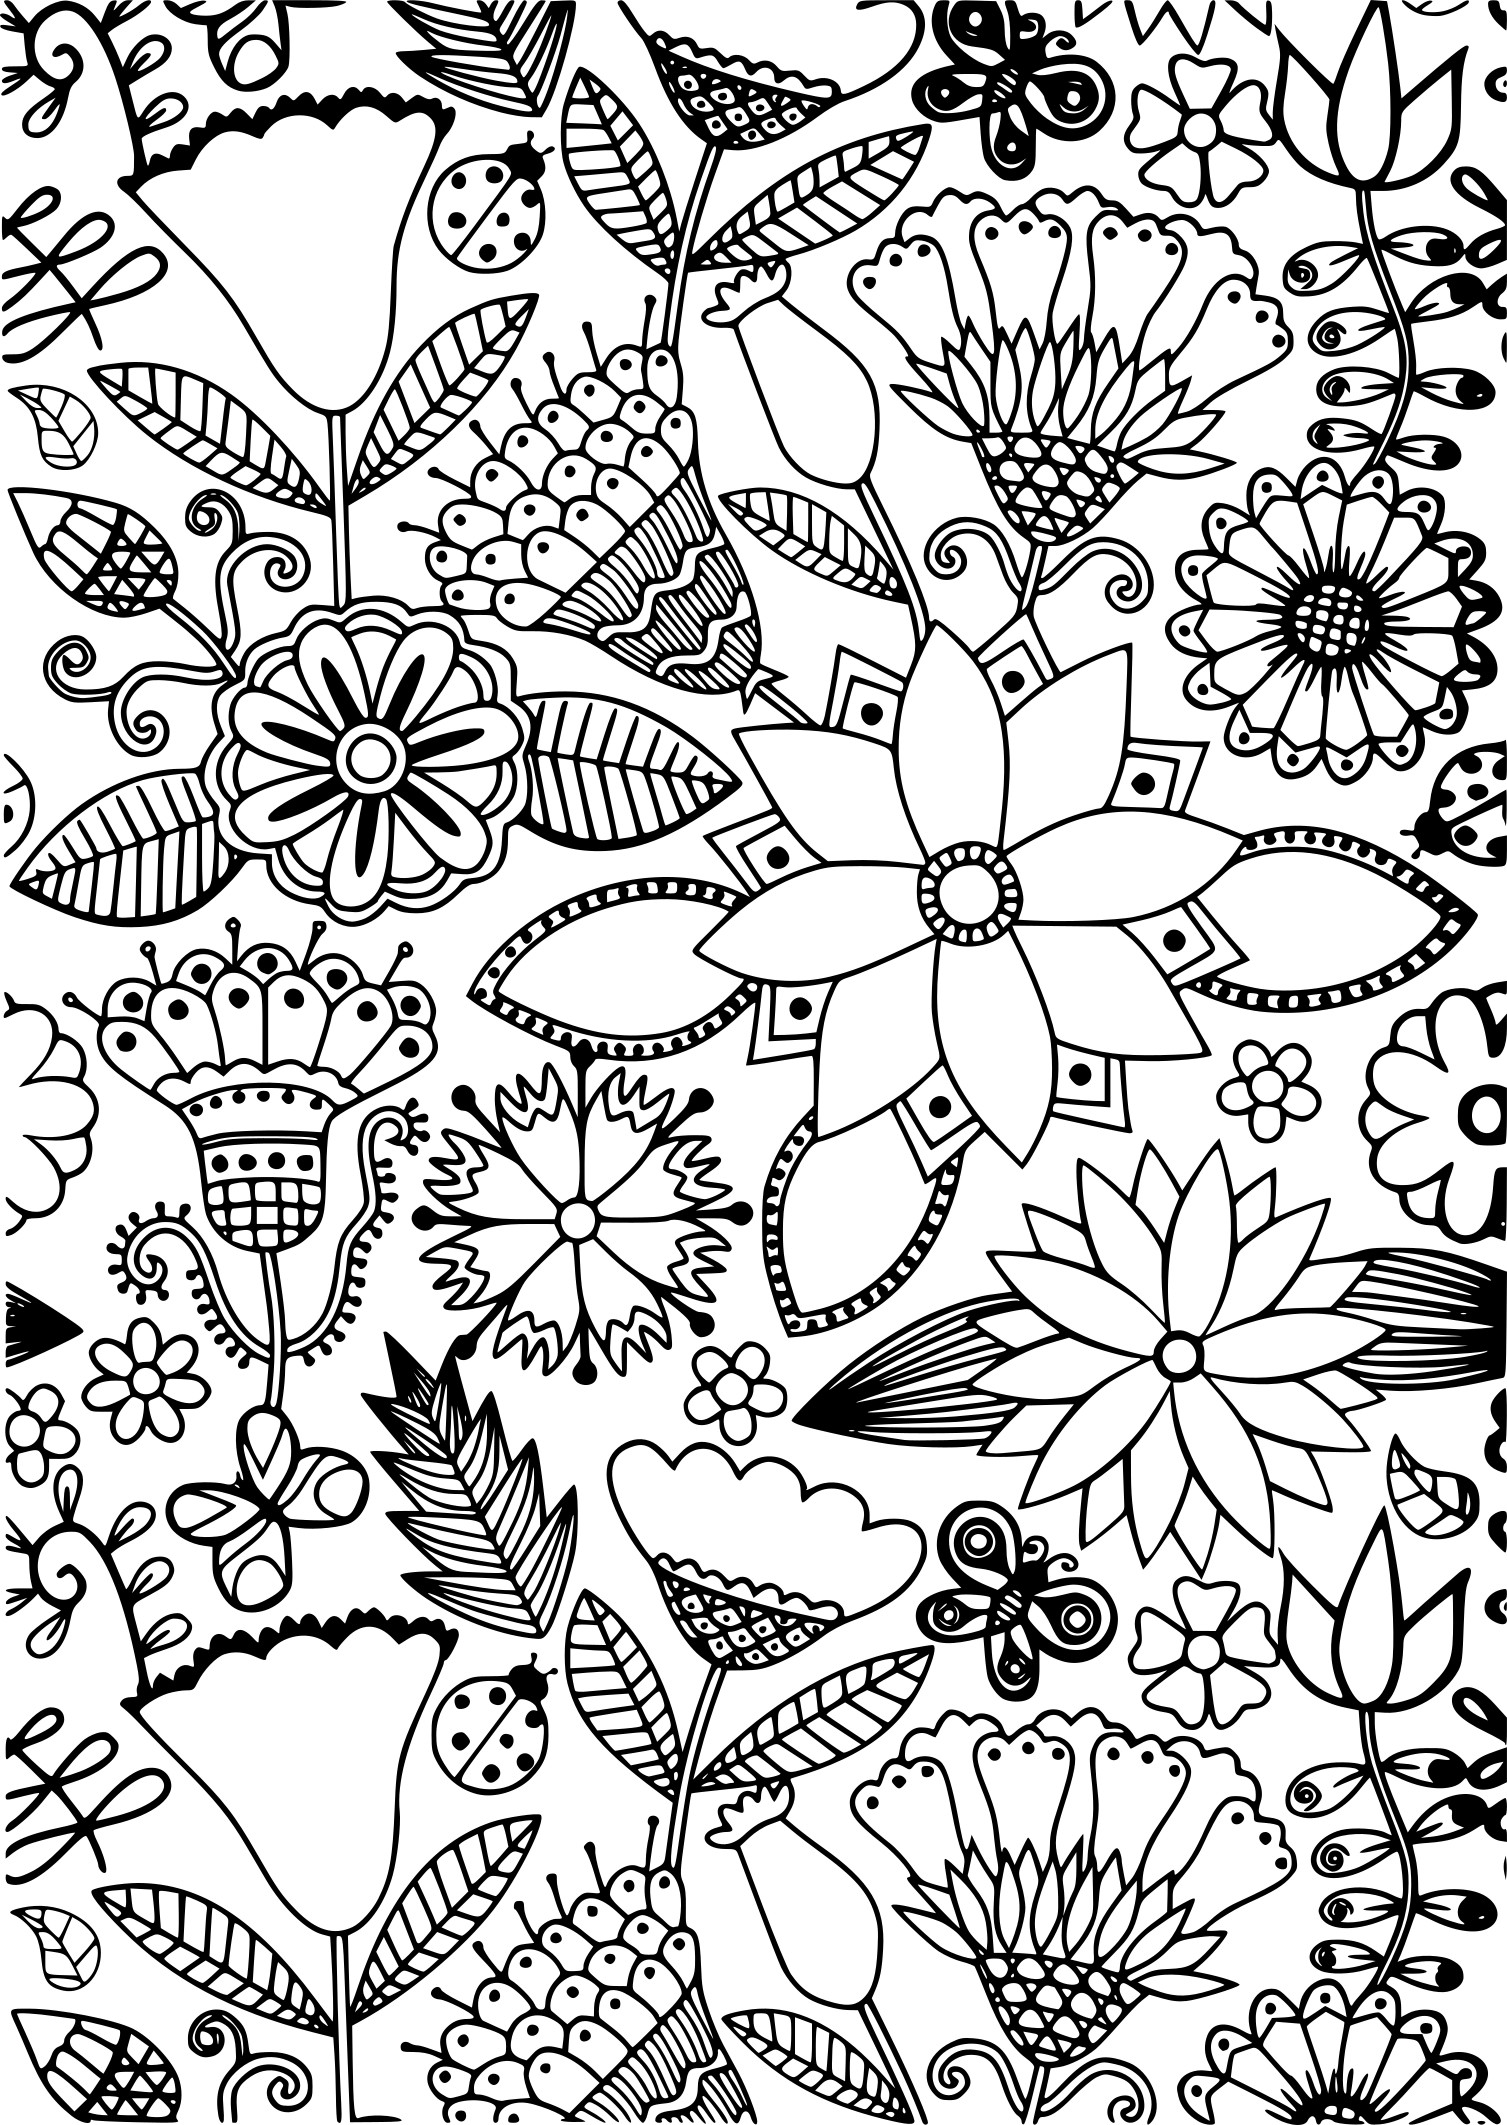 Coloriage anti stress fleurs imprimer - Dessin anti stresse ...